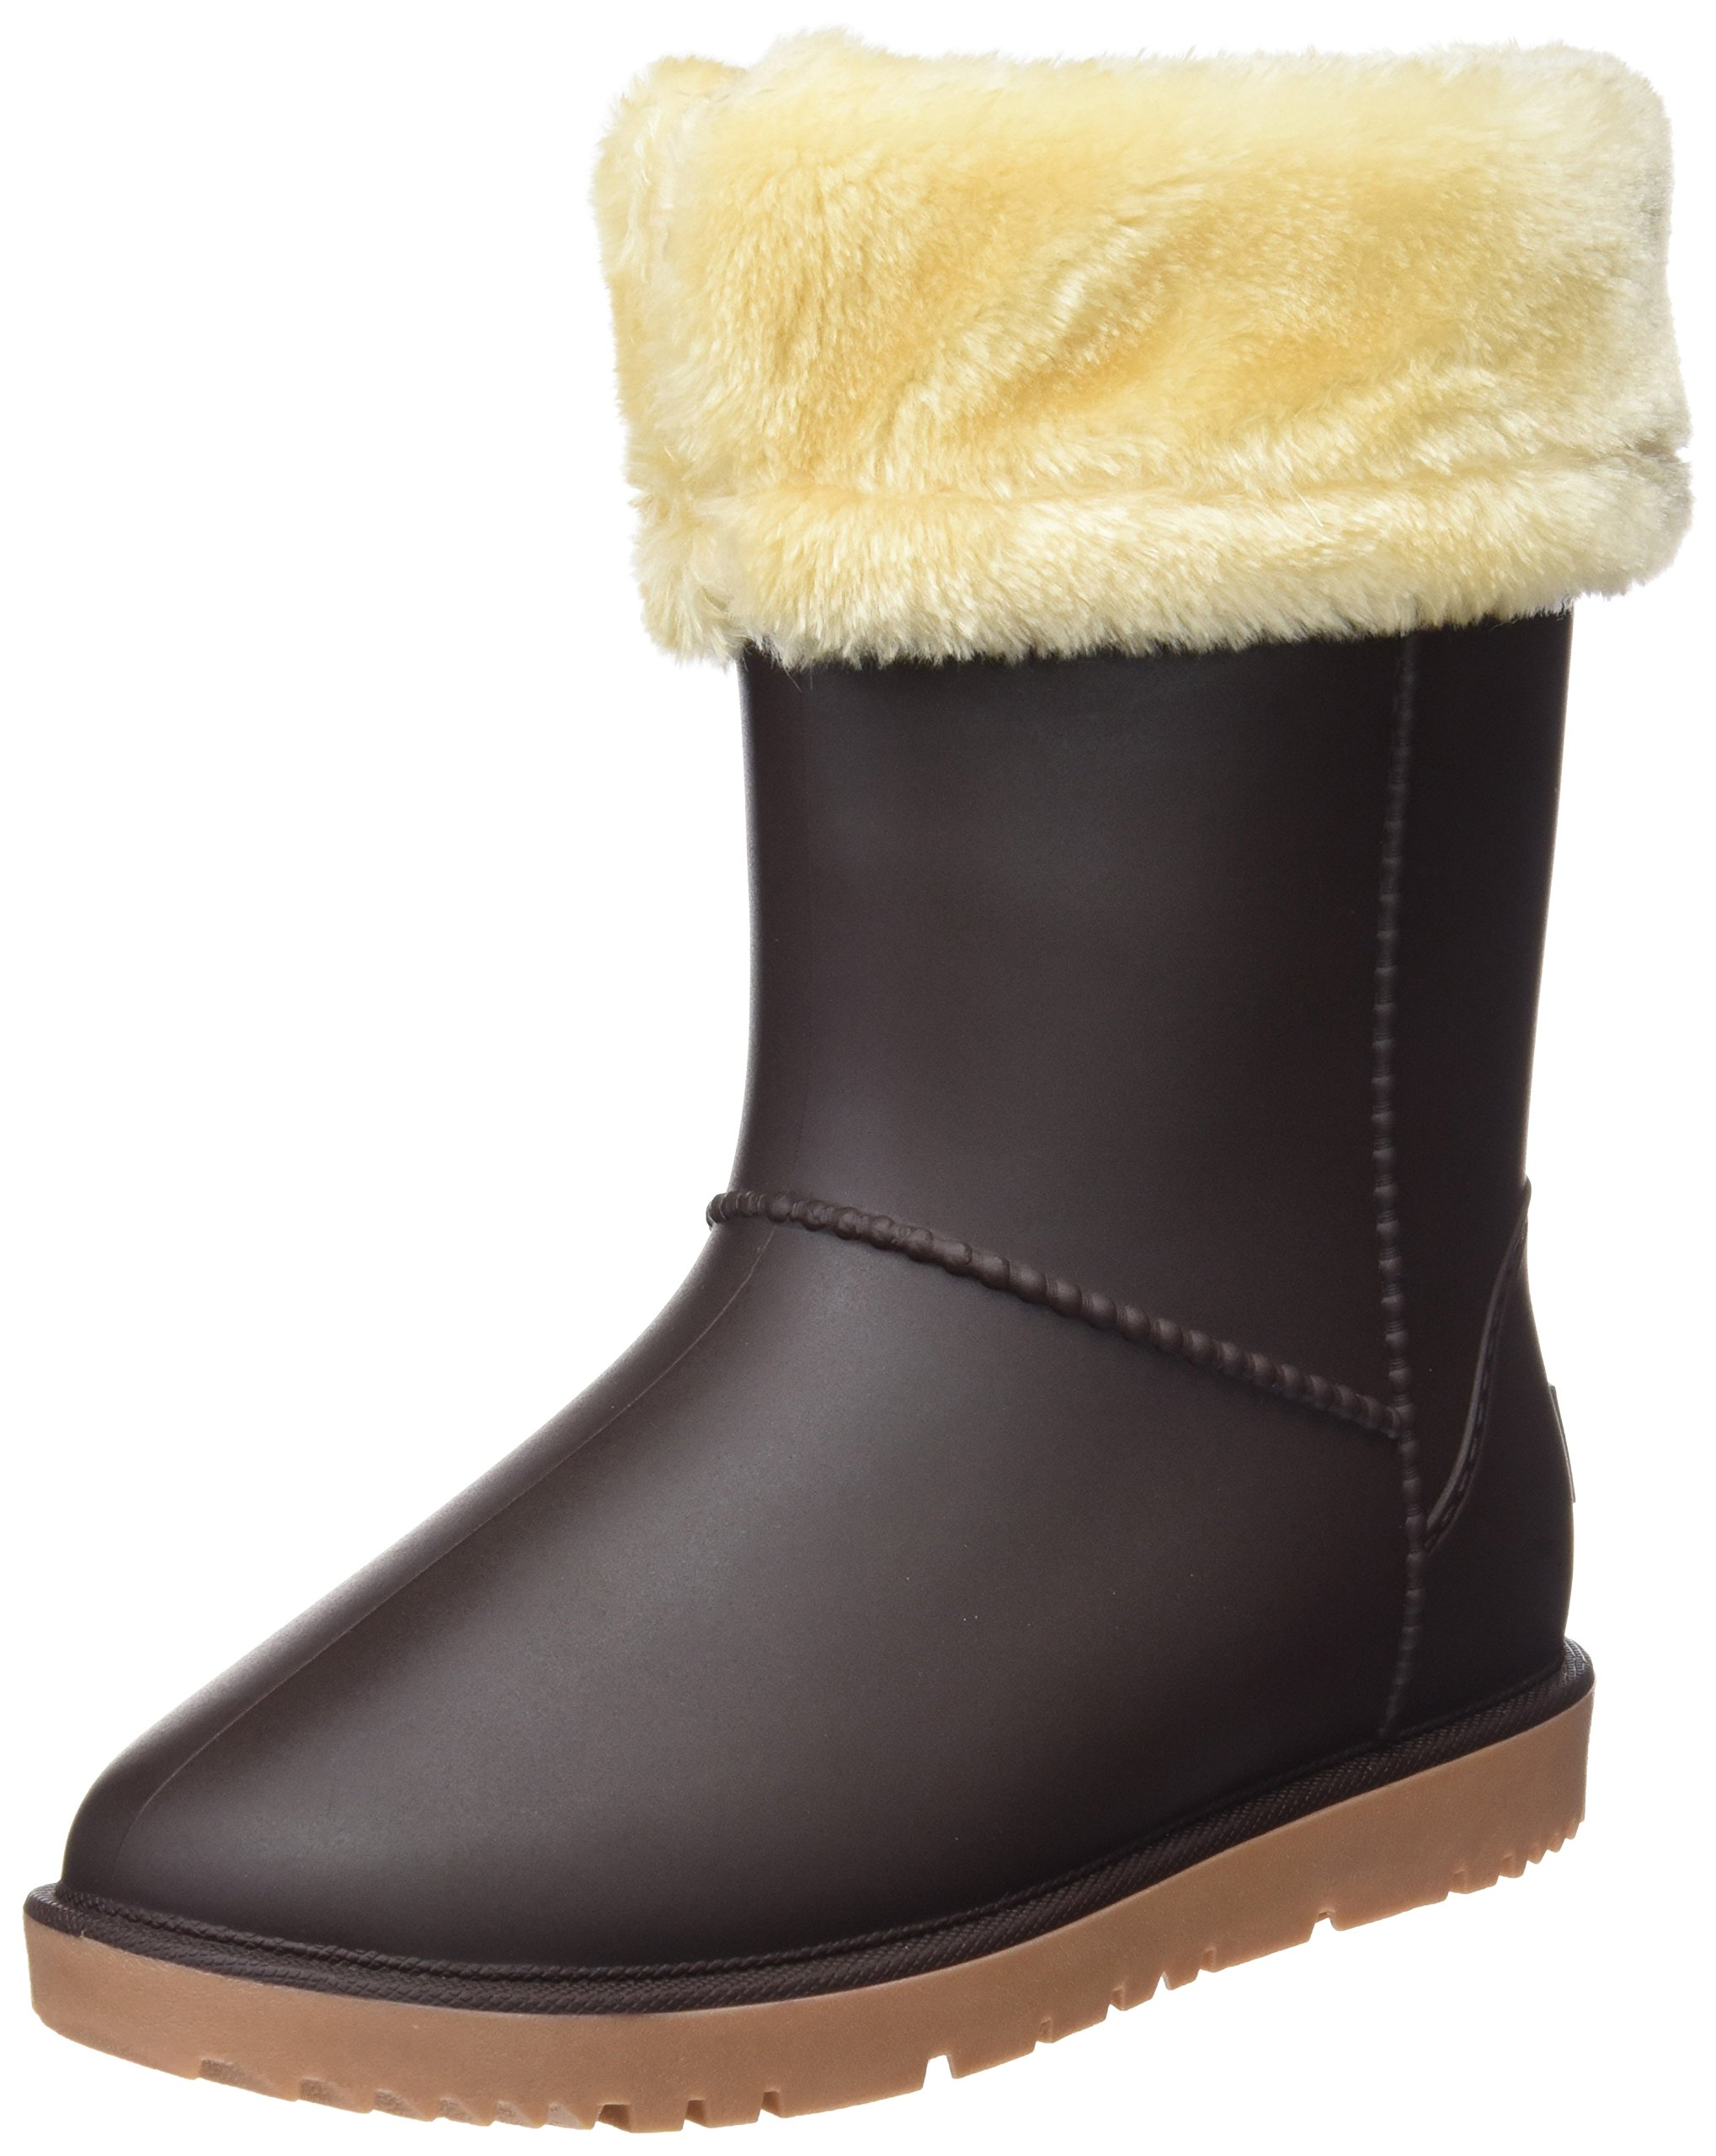 Chaussures FemmeMarronchocolate41 Sports Eu Aquatiques Gioseppo 30404 De eDWH2IY9bE